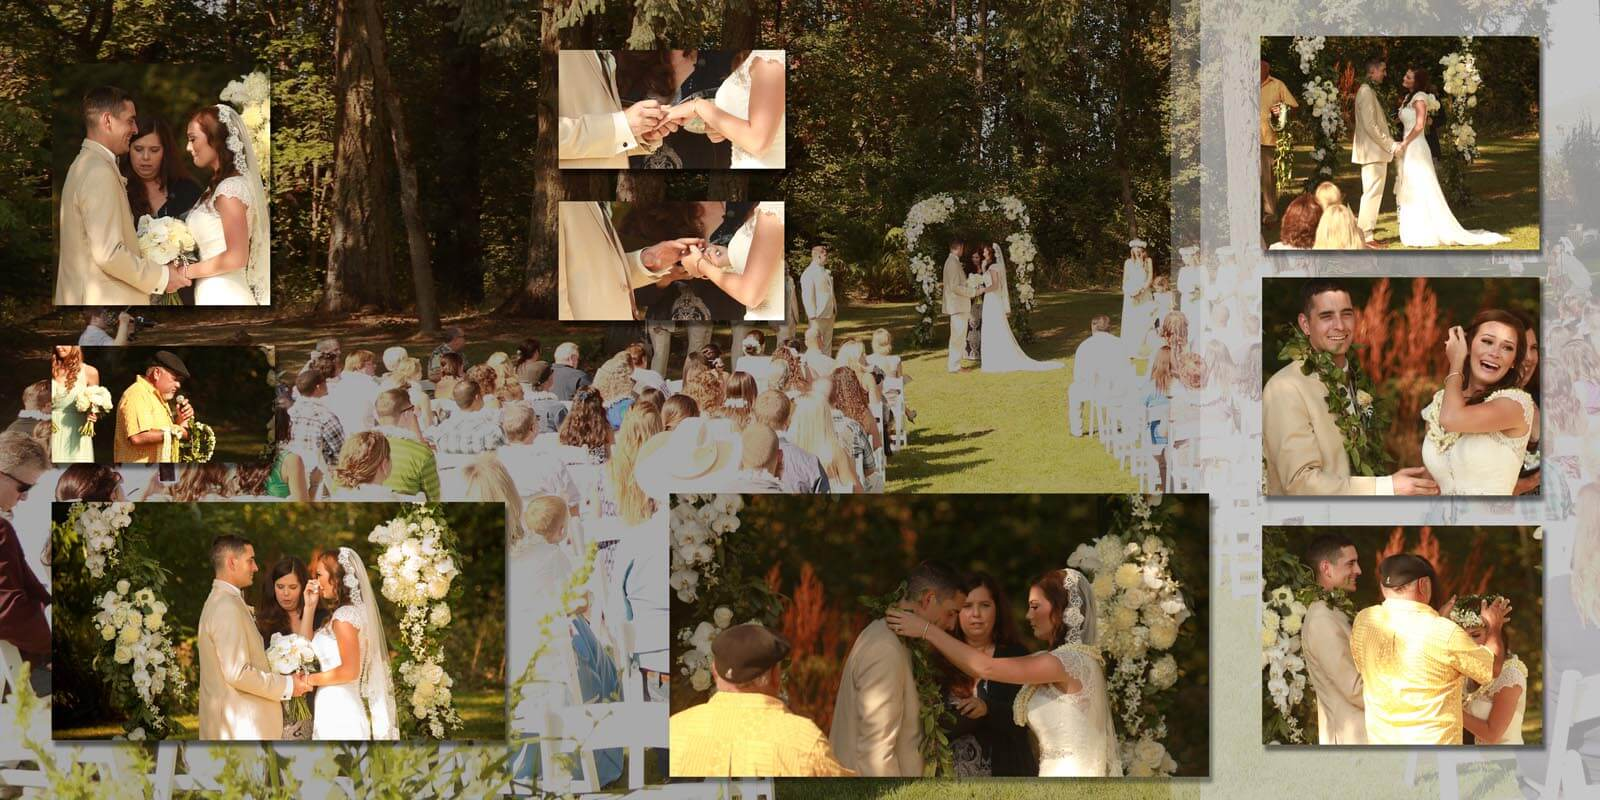 Jasper-House-Farm-Outdoor-Wedding-Lane-County-Oregon-photographers-044-045.jpg